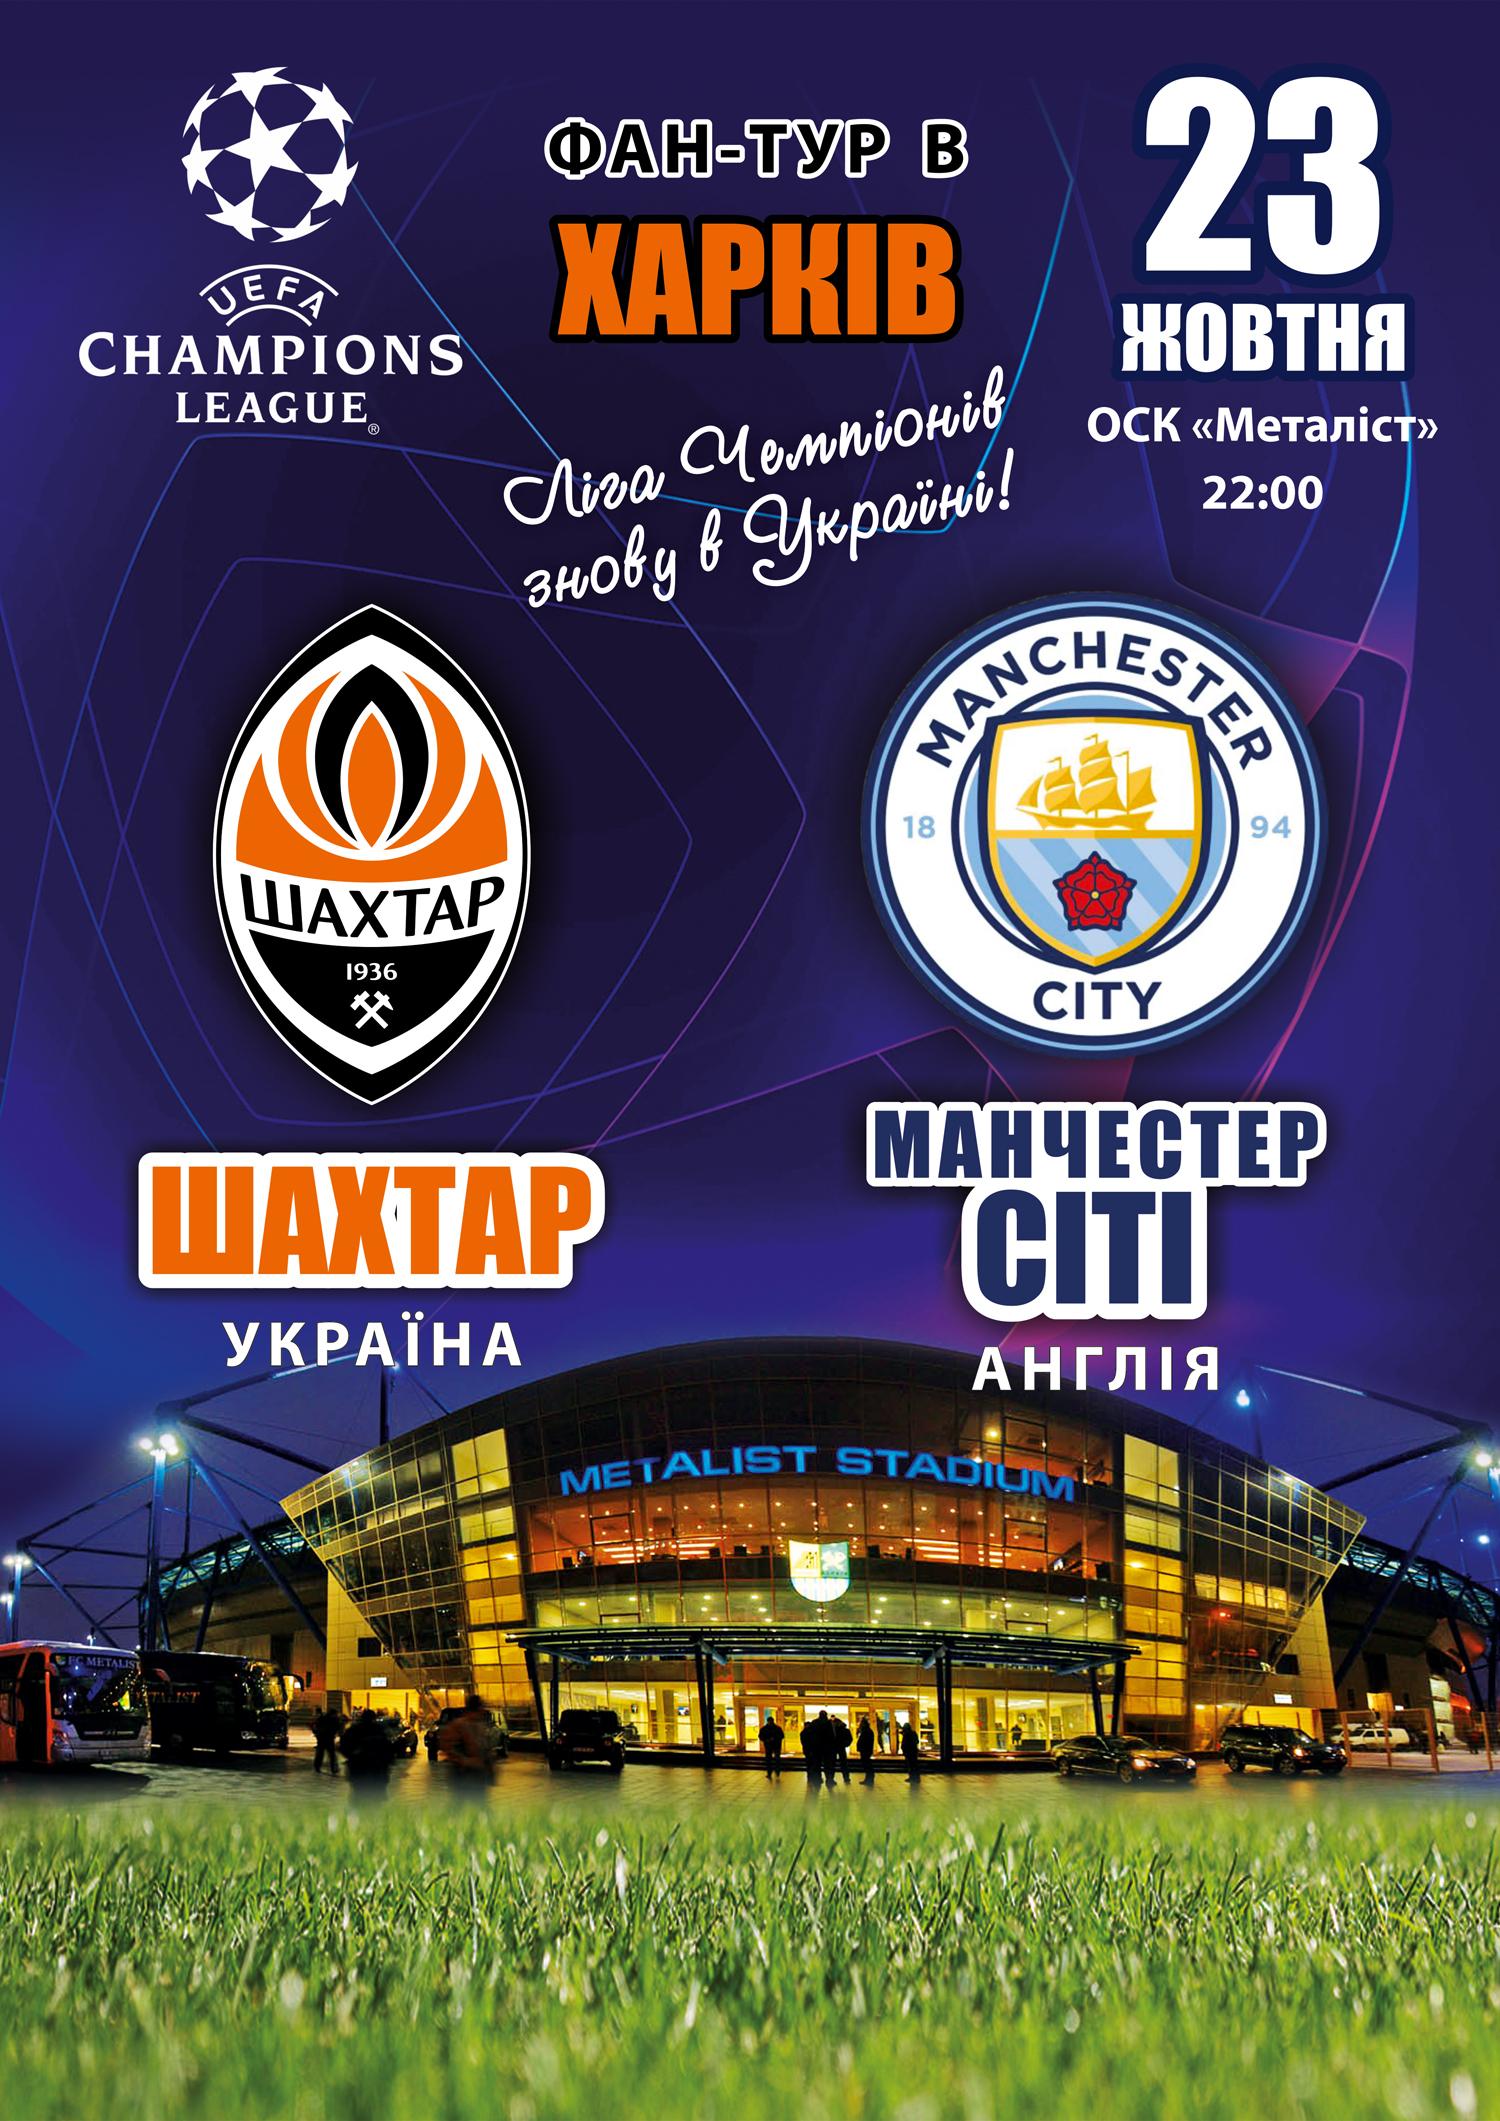 Фан-тур на матч Лиги Чемпионов Шахтер–Манчестер Сити (Киев)